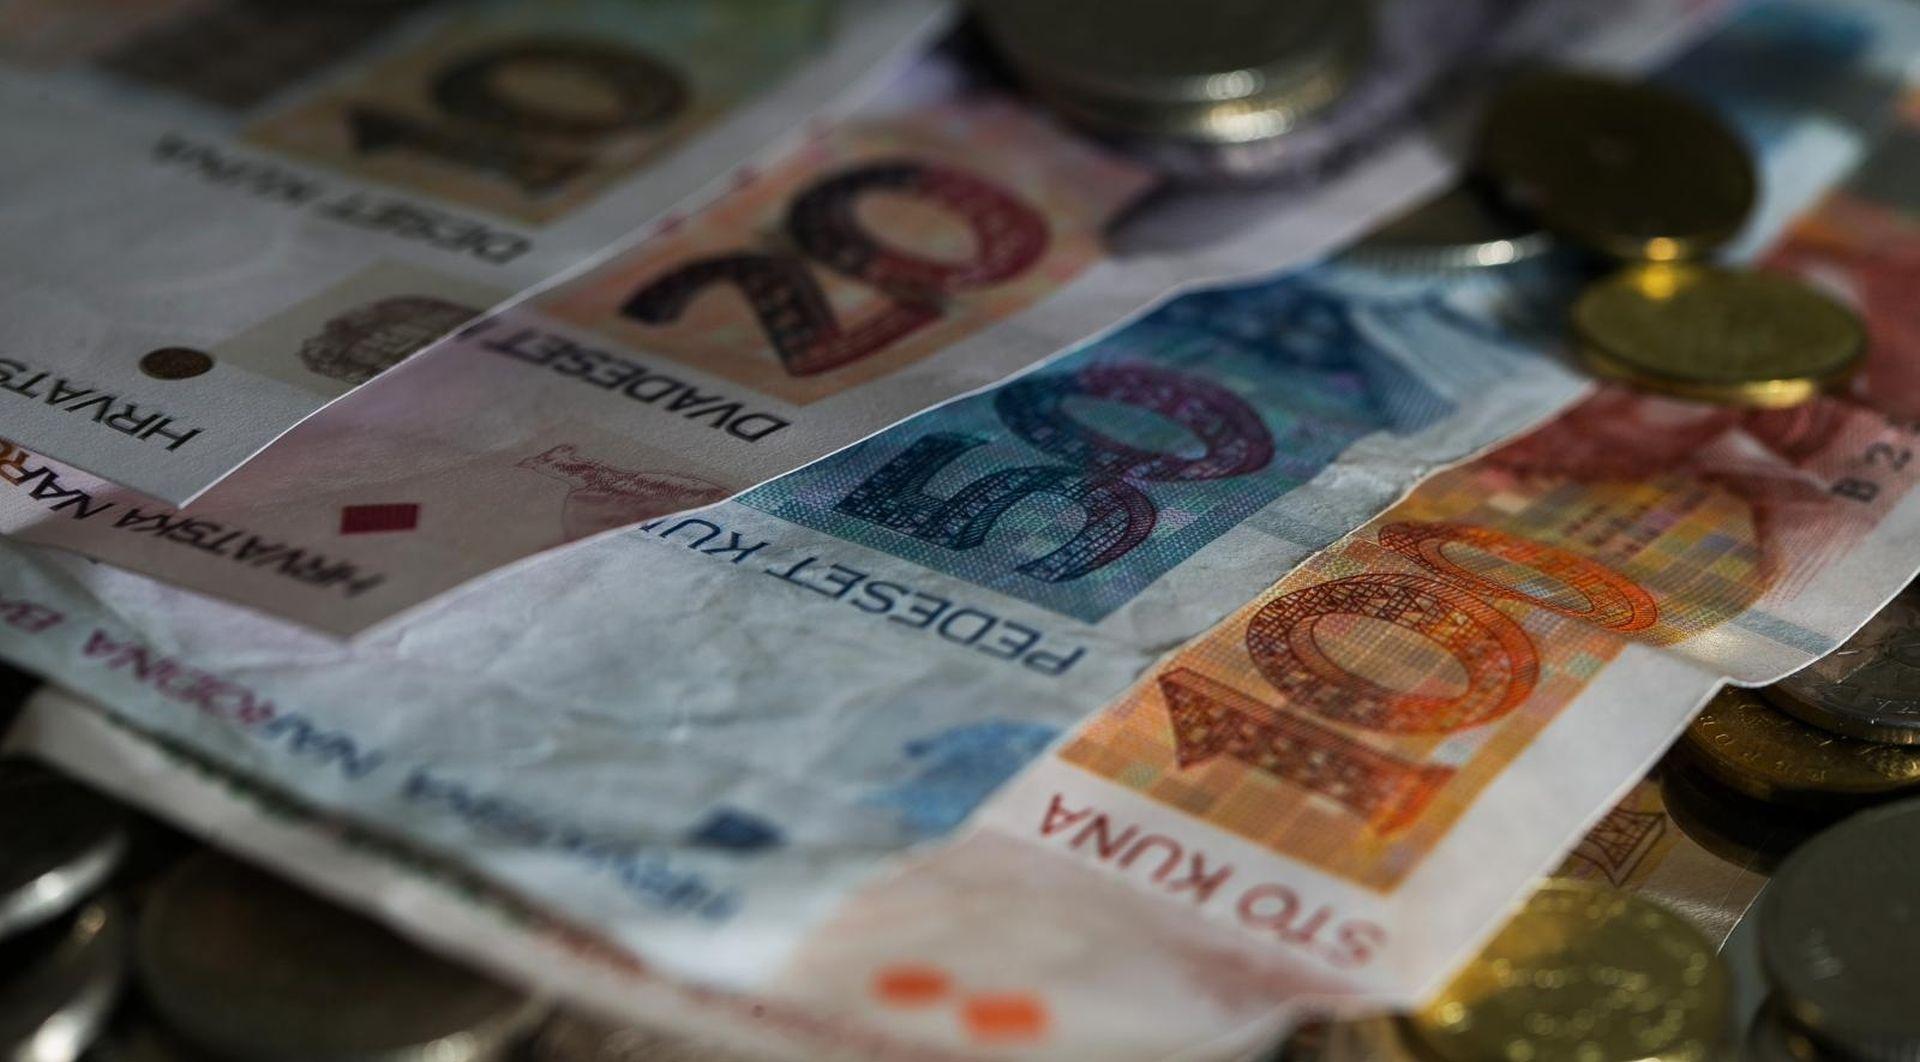 DZS Prosječna neto plaća za listopad 6.281 kuna